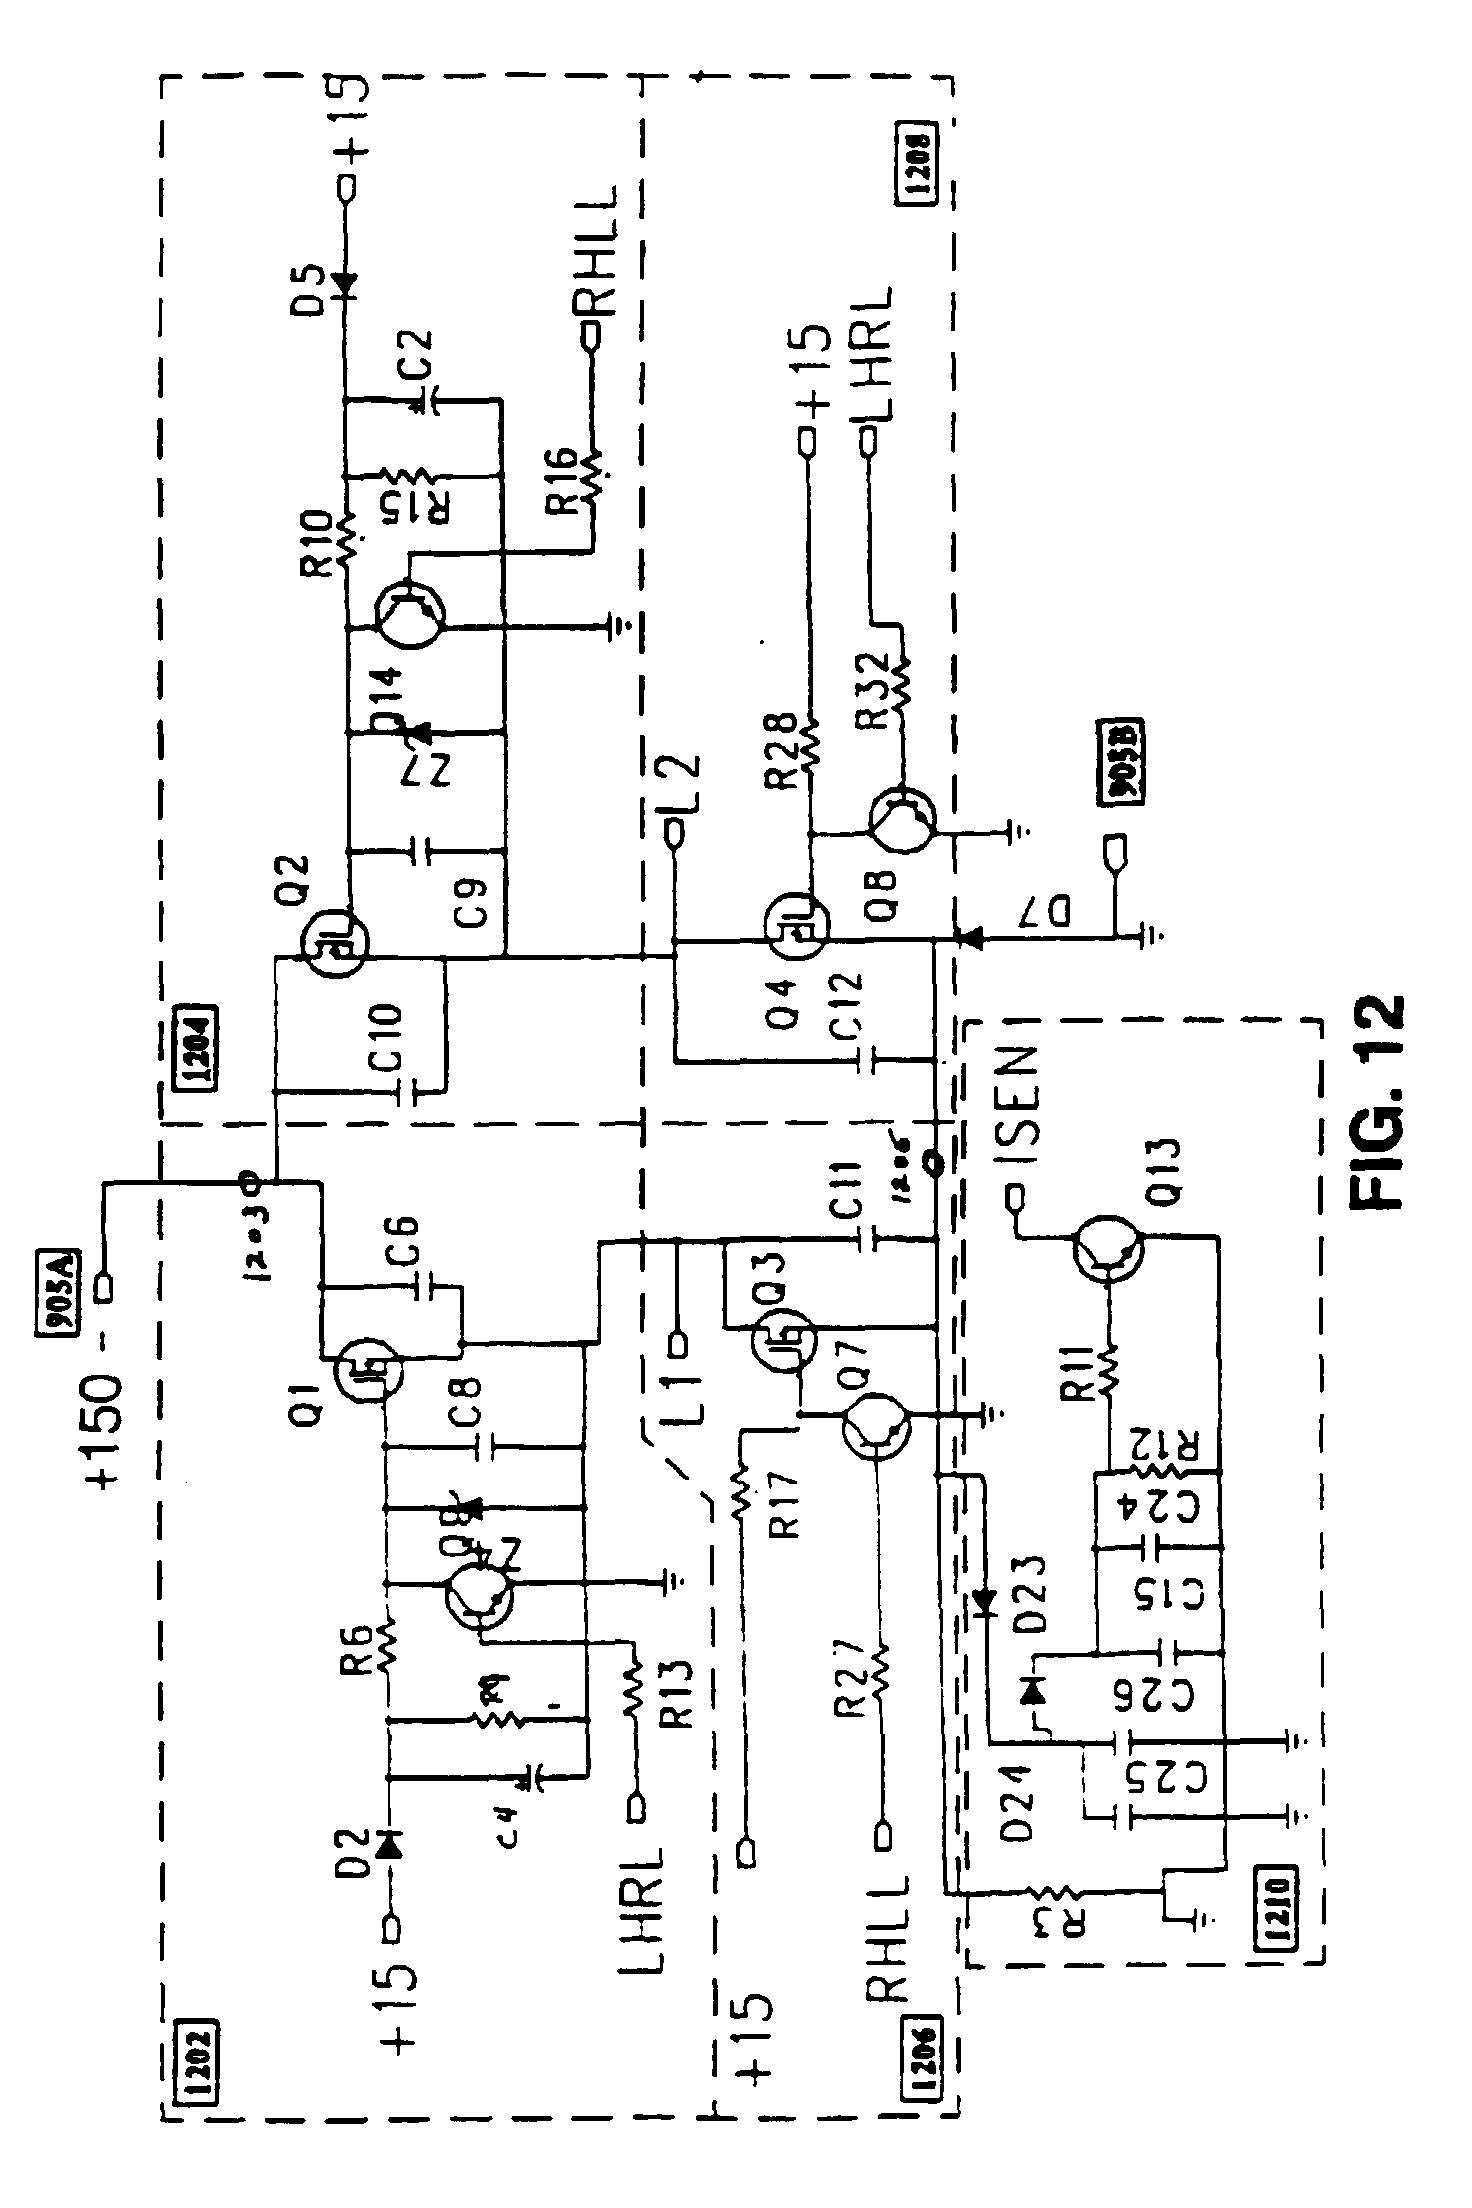 Generac Wiring Avr Great Design Of Diagram Kipor Generator Voltage Regulator 11kw Schematic Transfer Switch